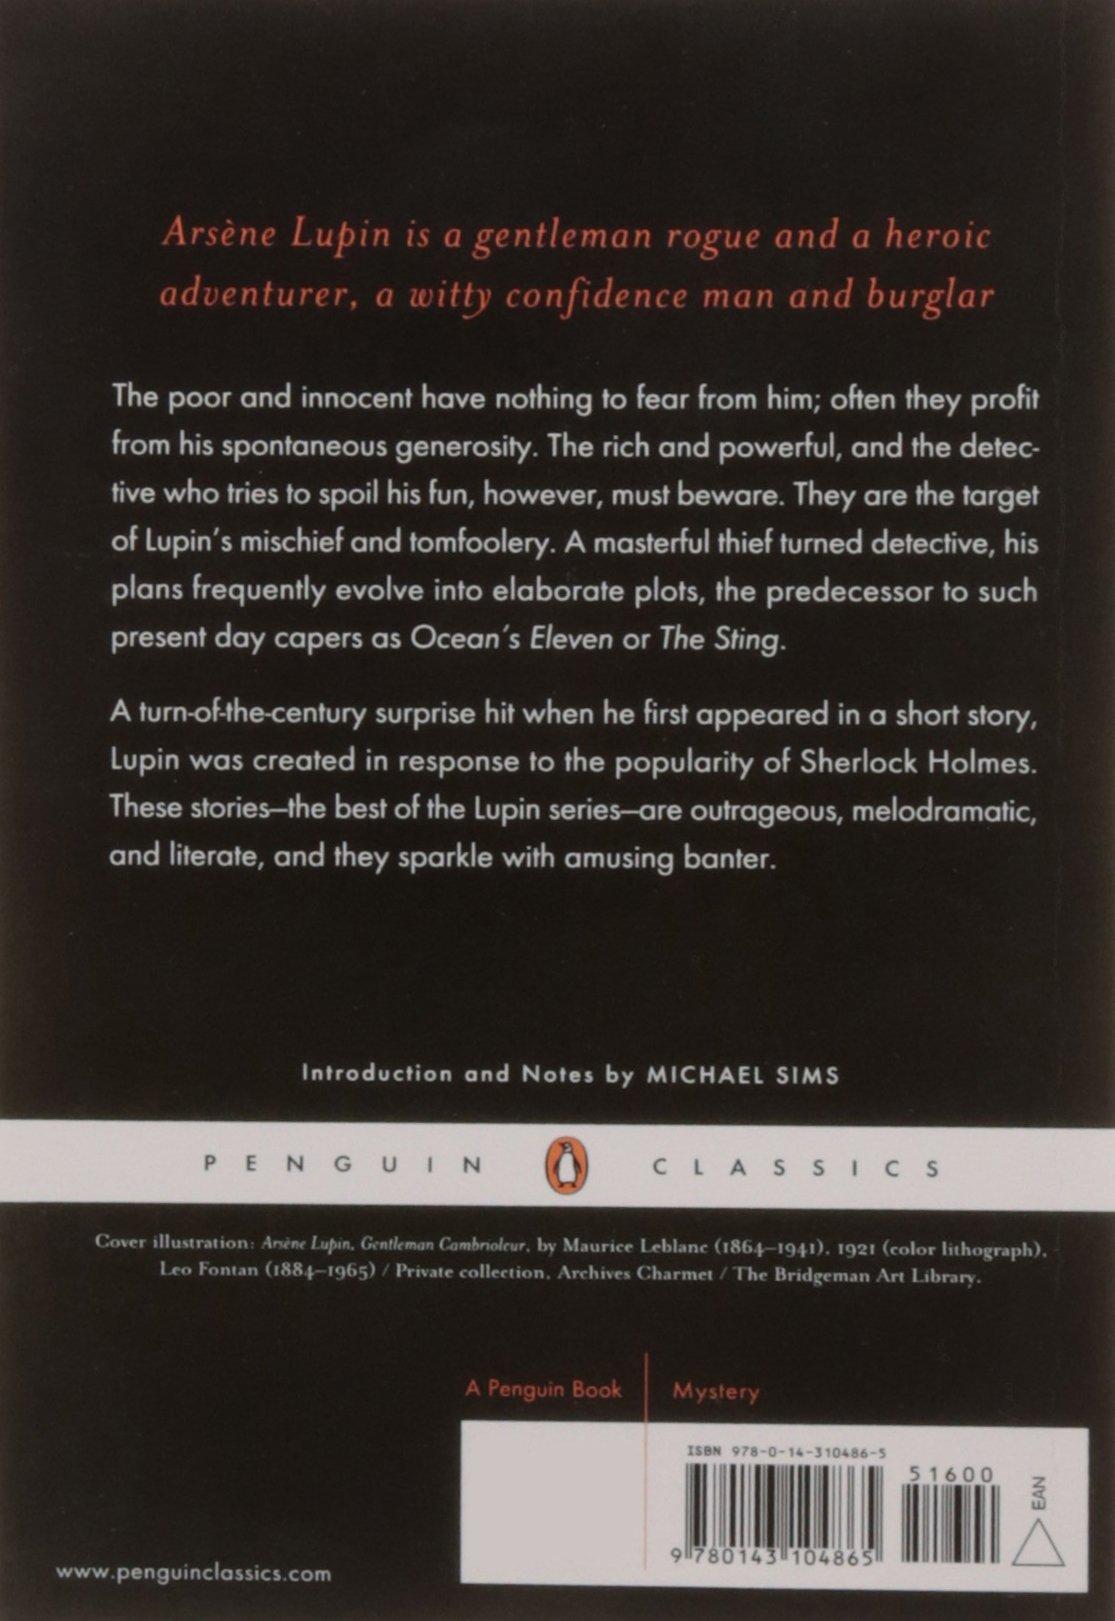 com arsene lupin gentleman thief penguin classics com arsene lupin gentleman thief penguin classics 9780143104865 maurice leblanc books